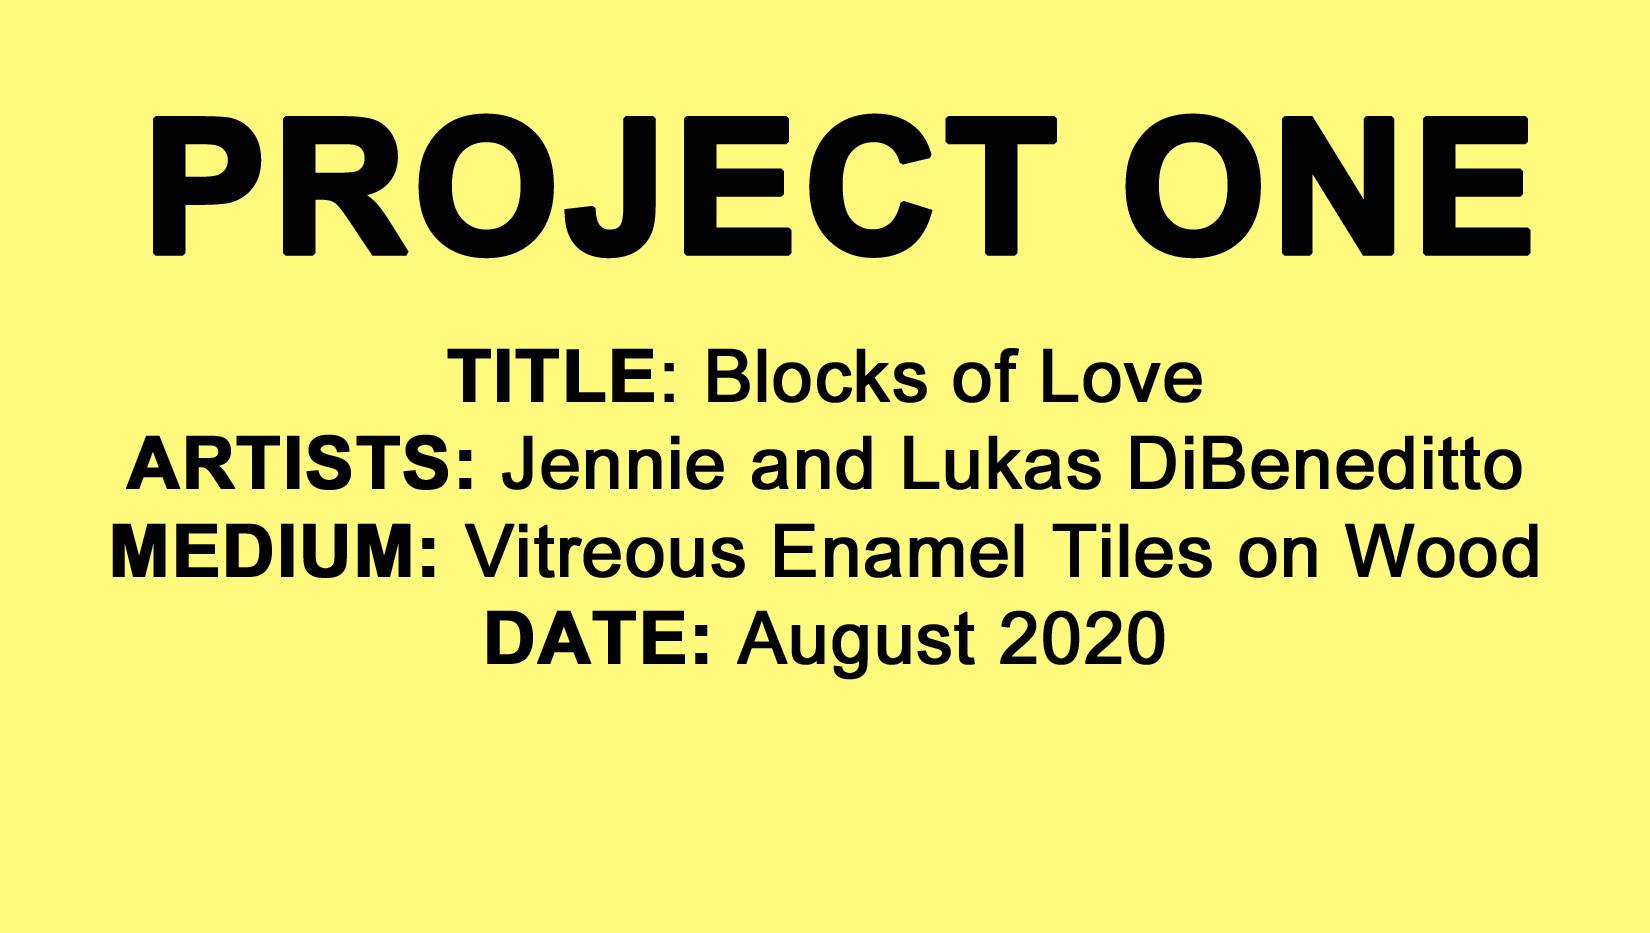 Blocks of Love